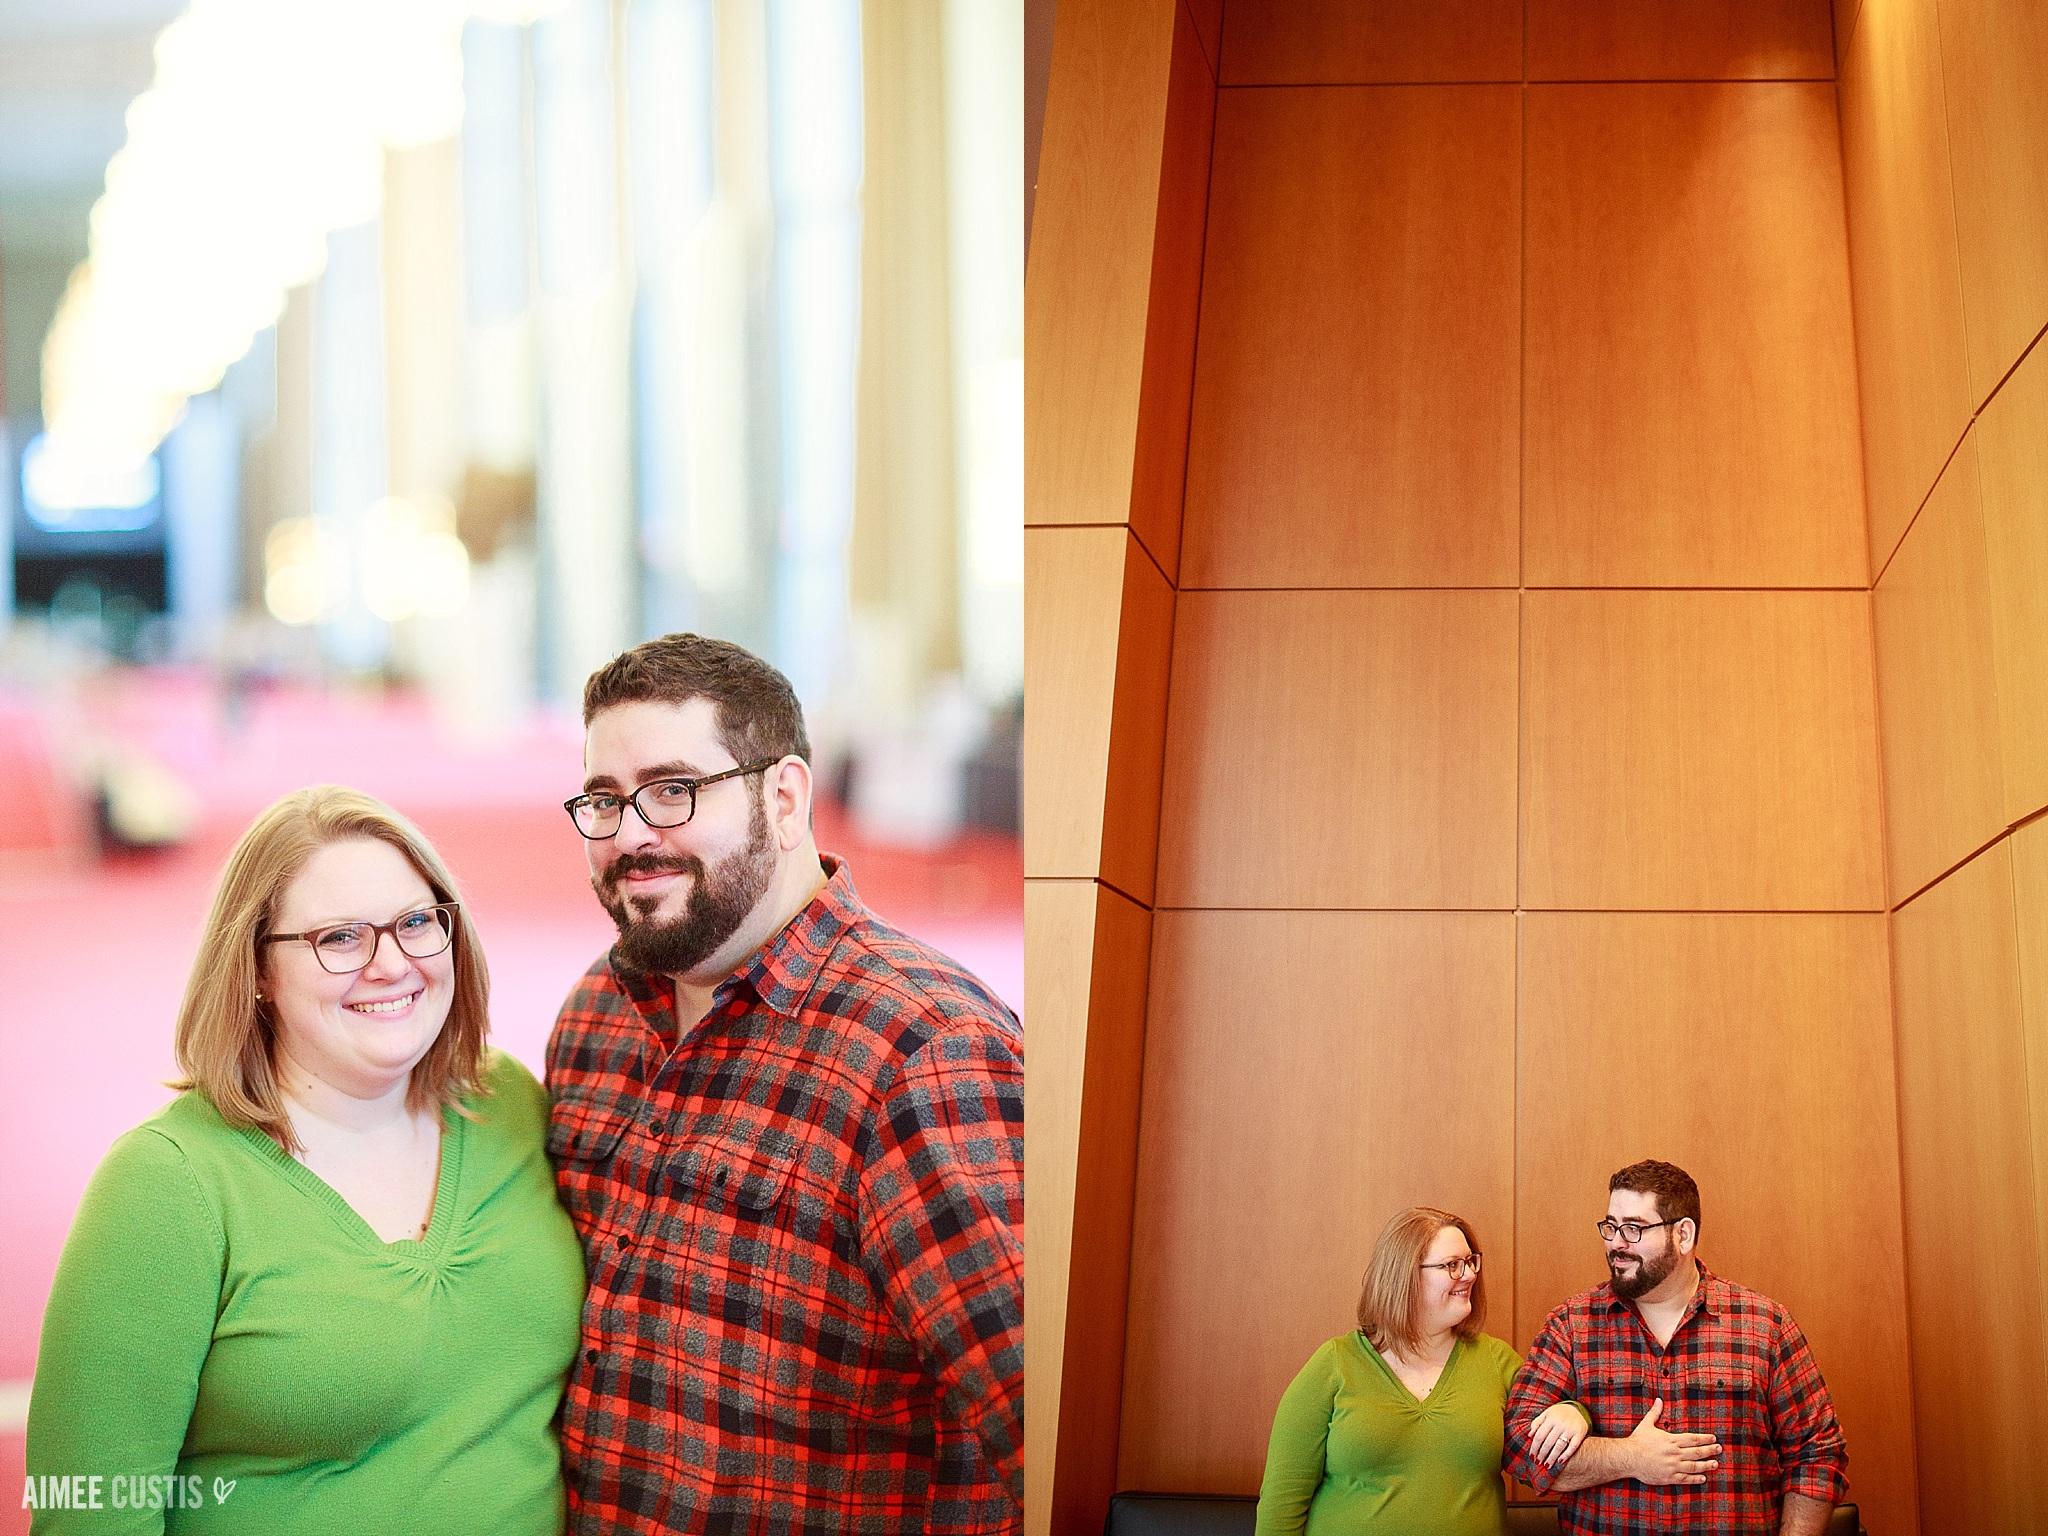 engagement photo locations in Washington DC